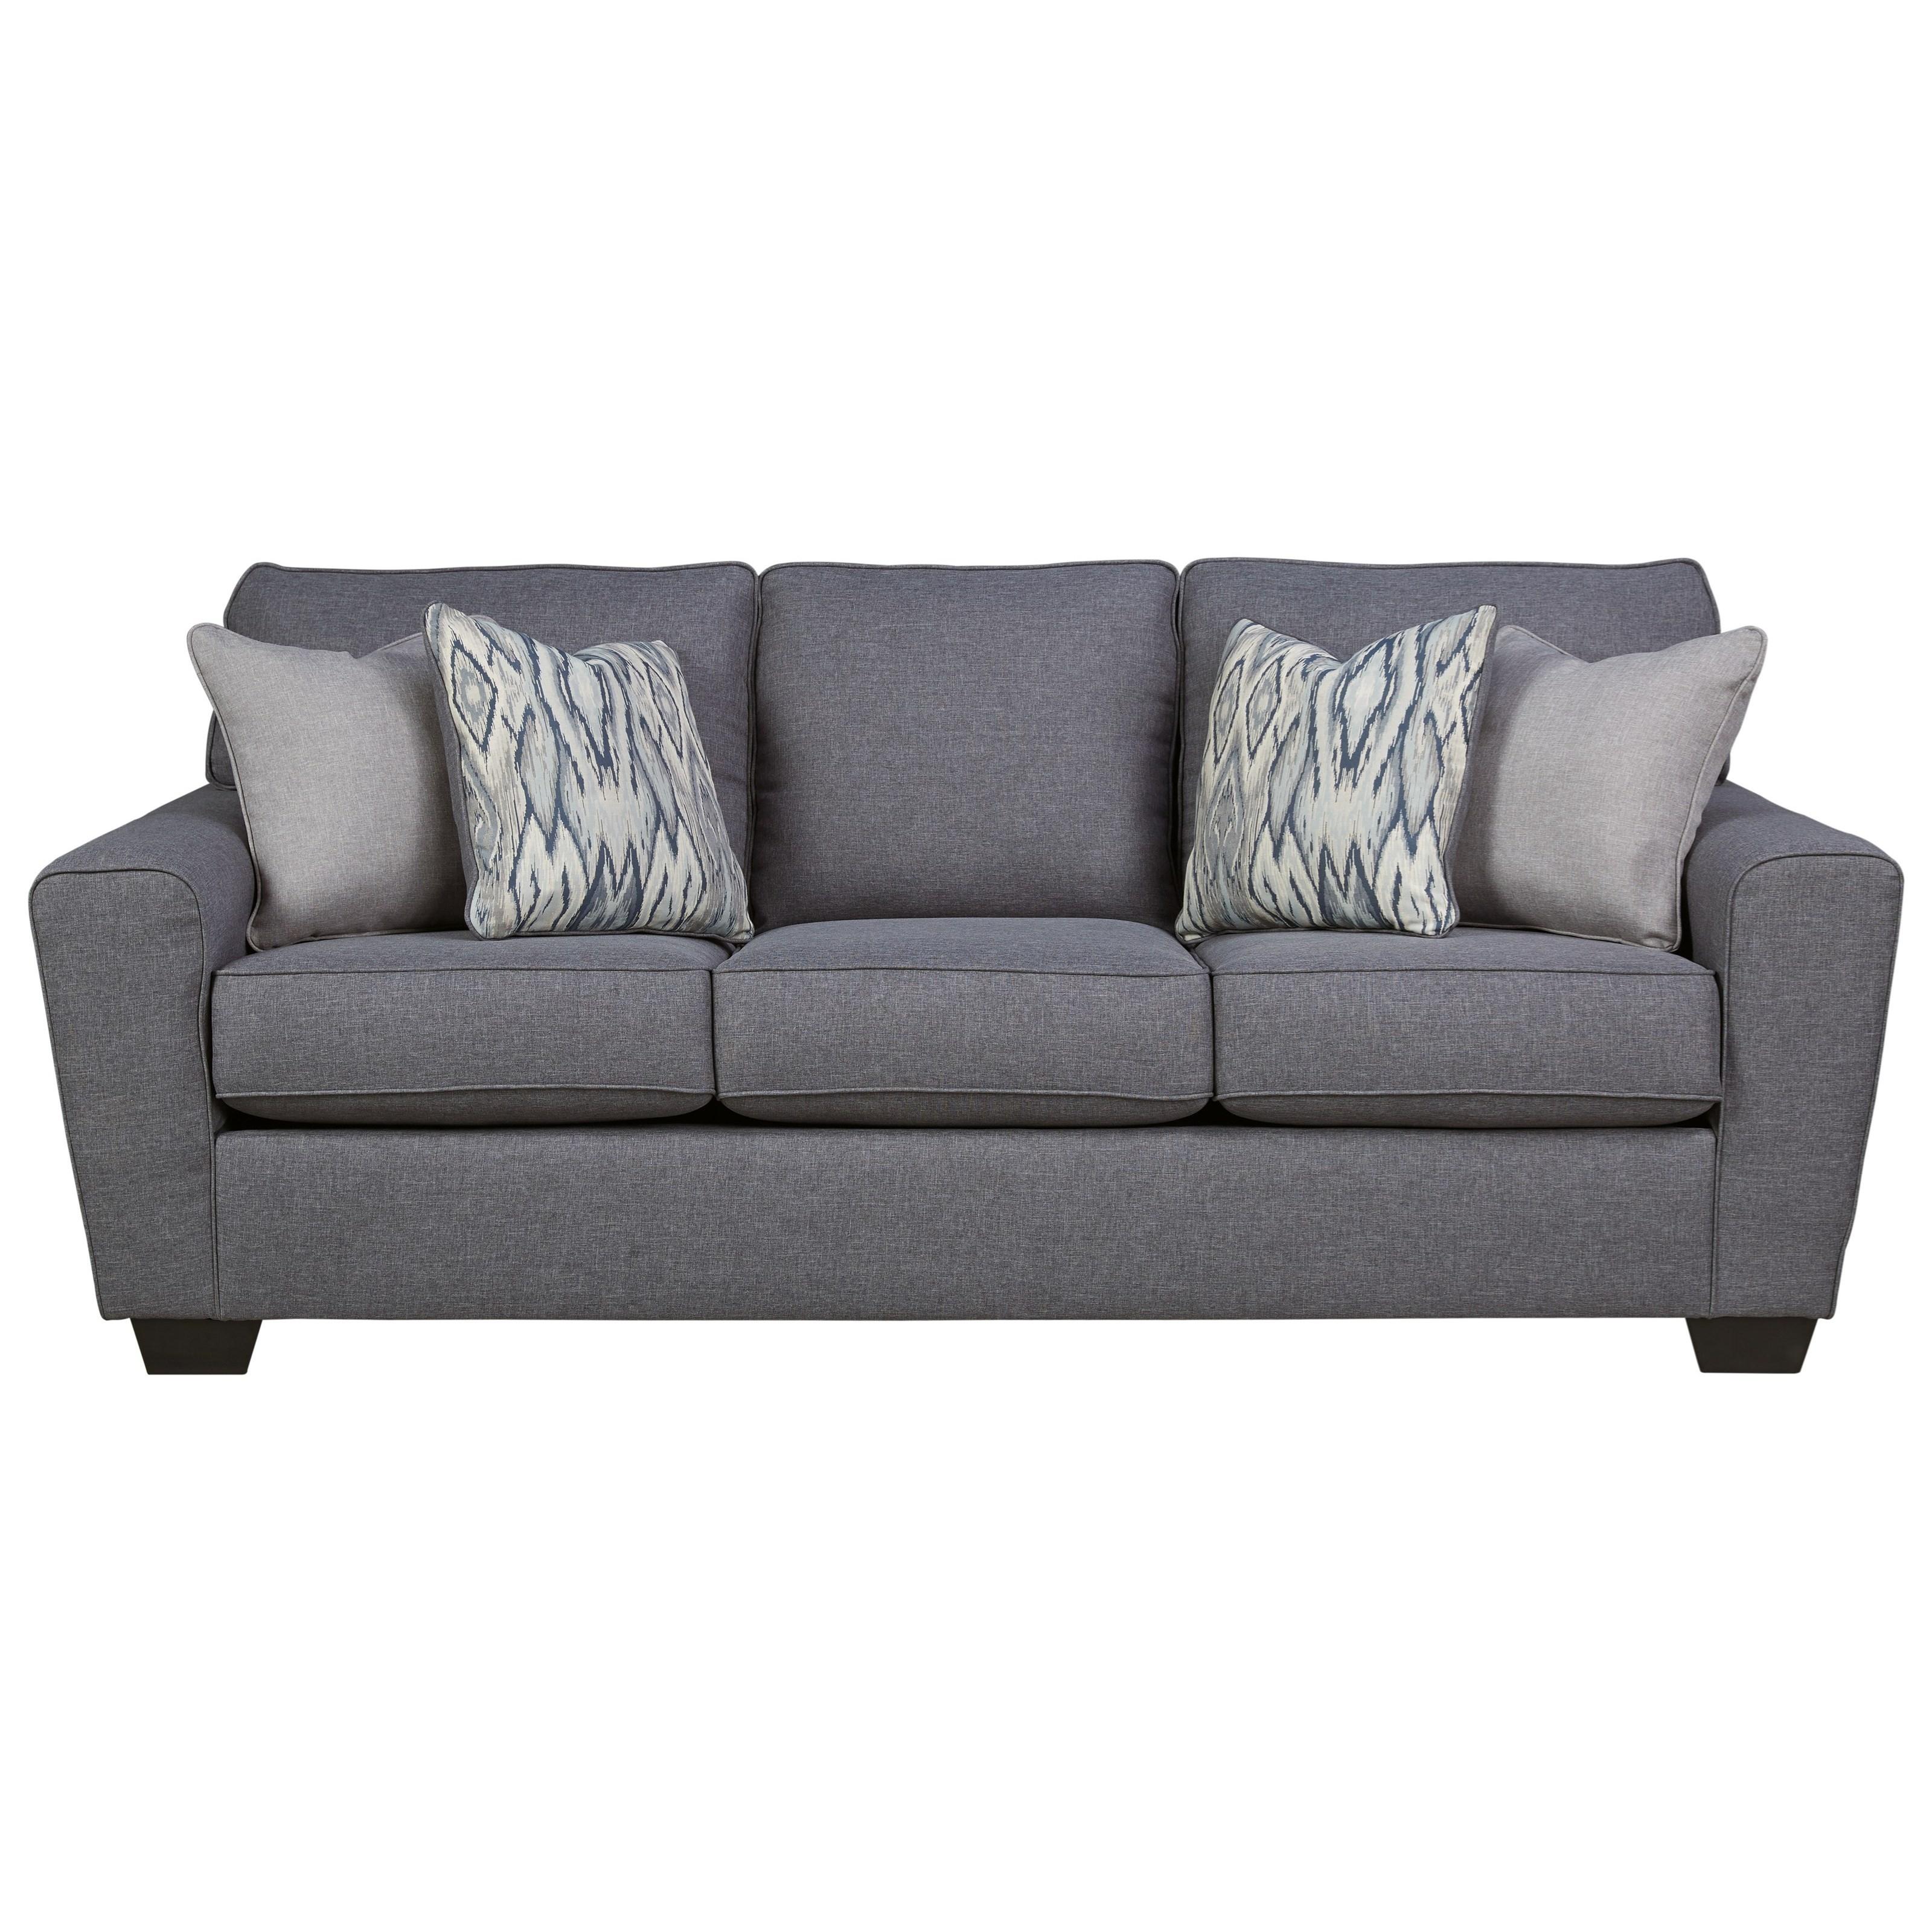 Calion Sofa by Ashley Furniture at HomeWorld Furniture